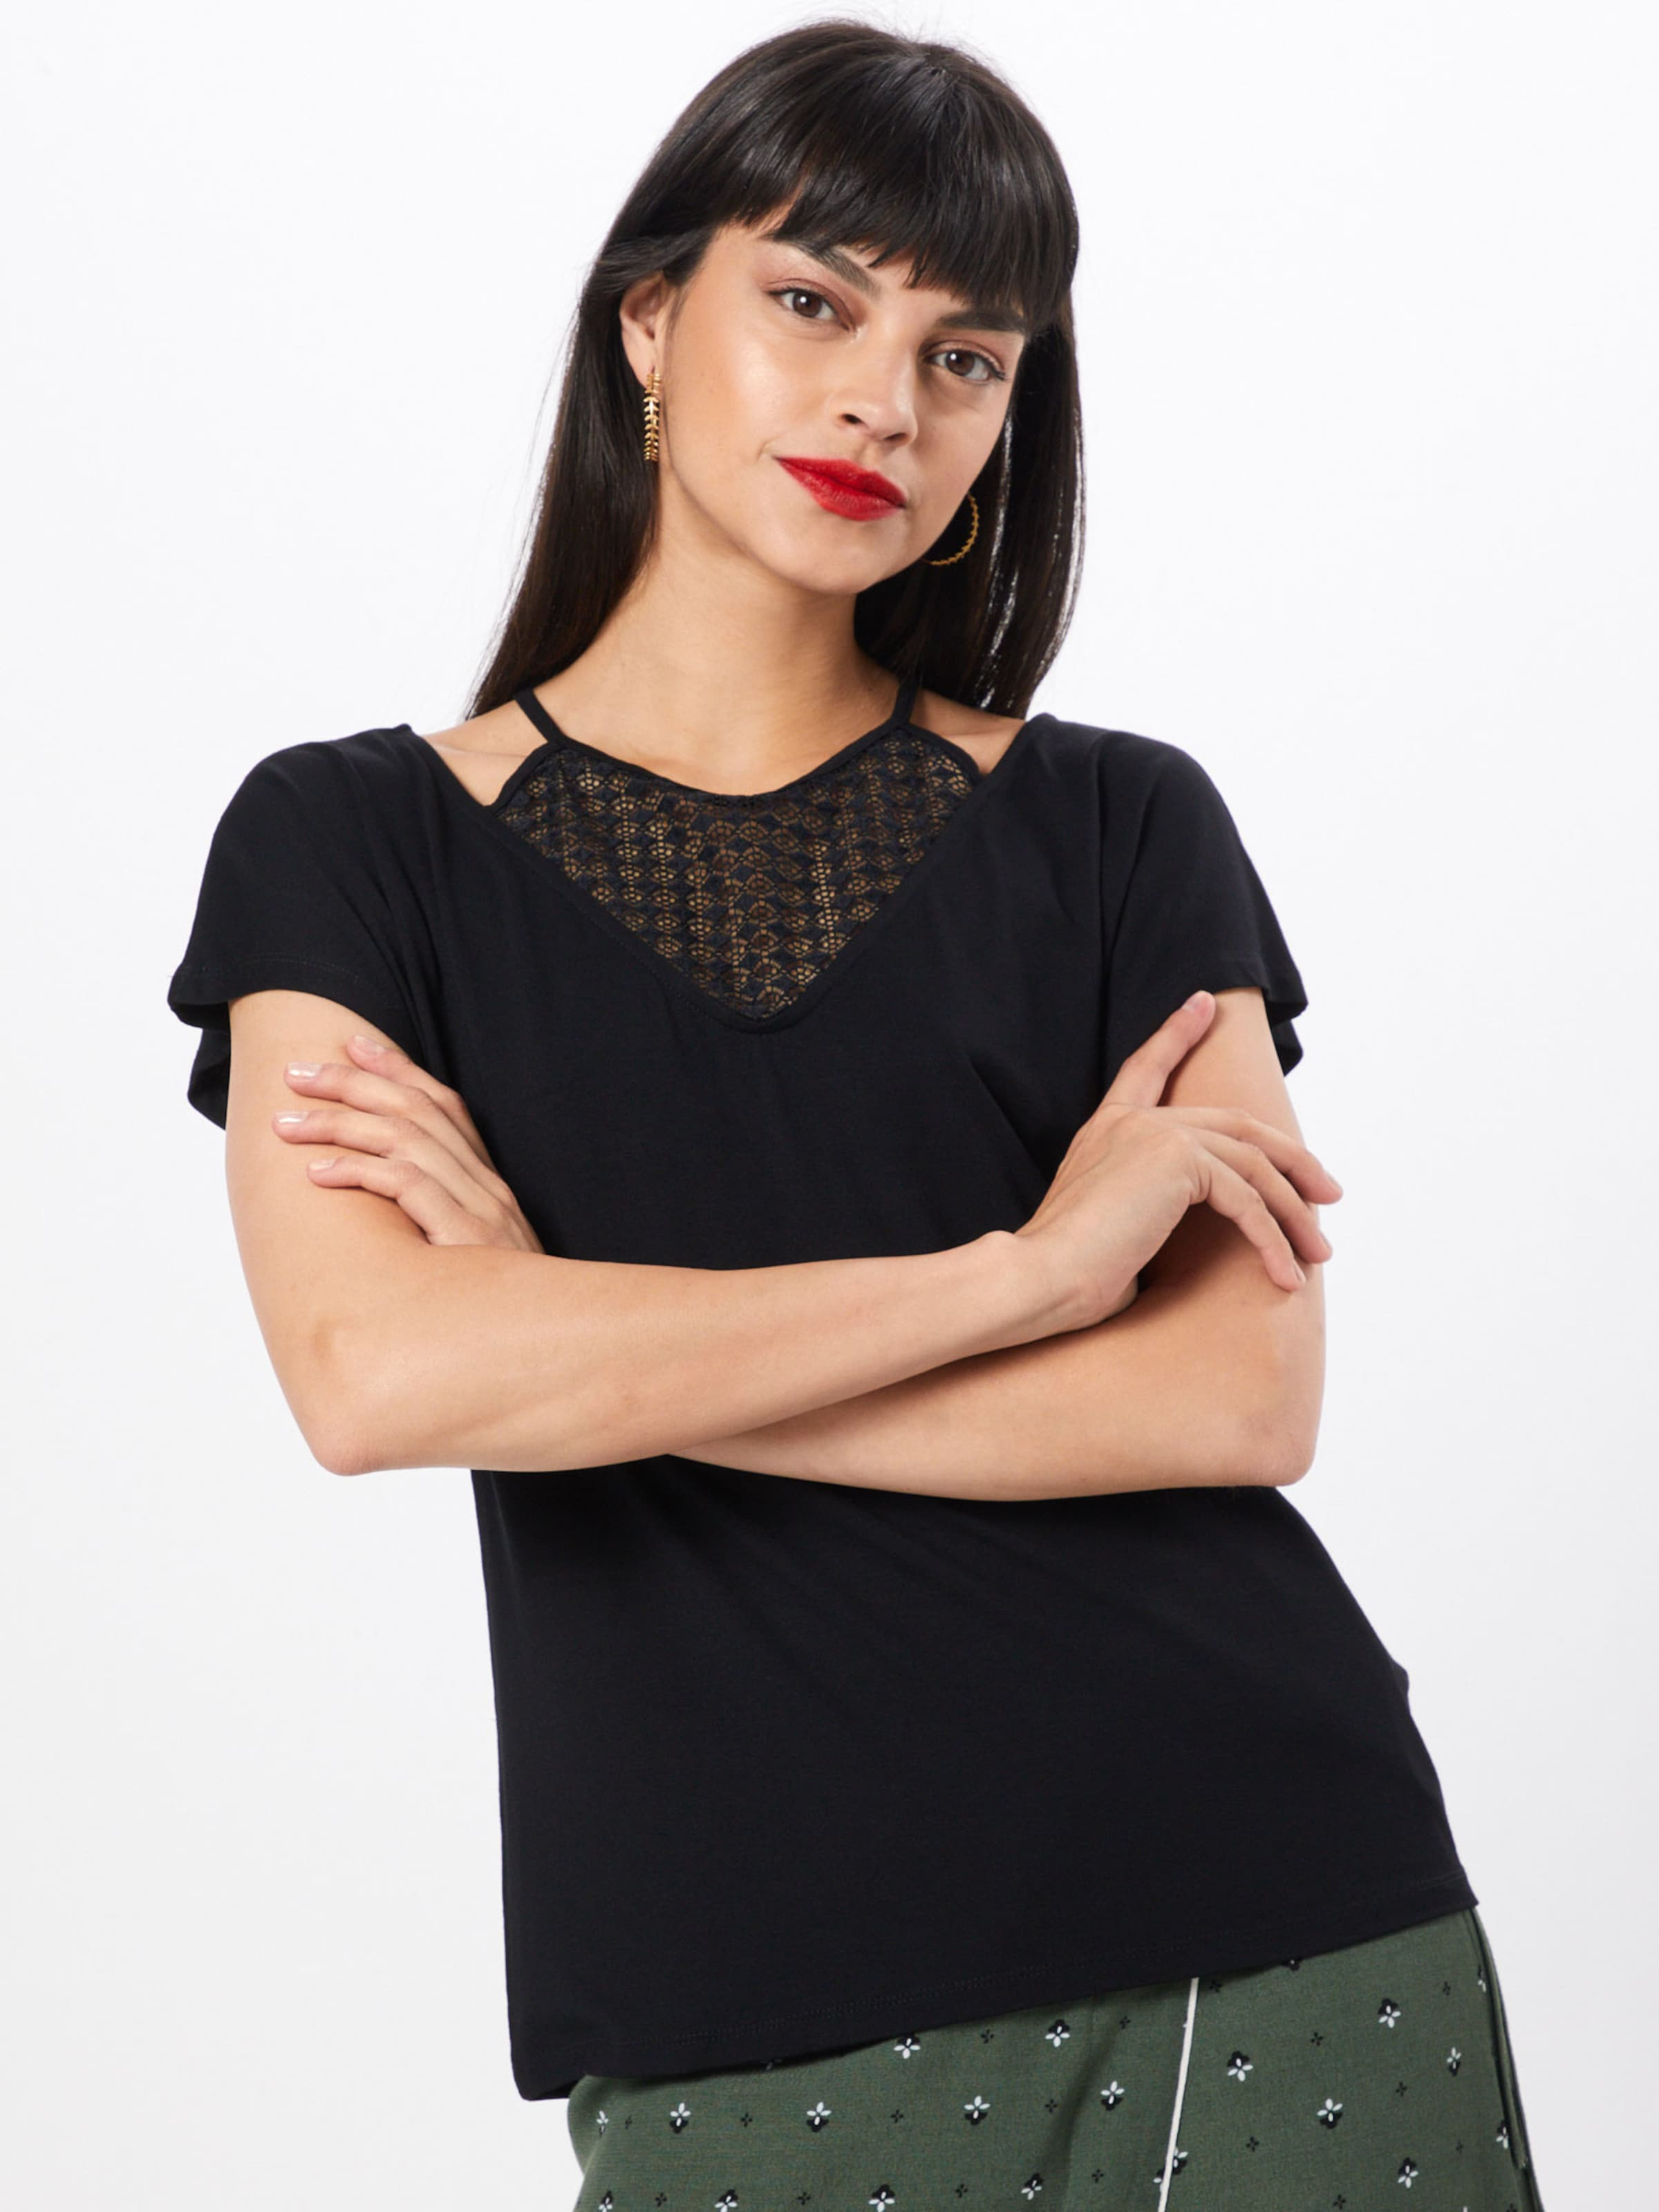 'lieven' shirt About Noir En You T N8Xwk0OnP